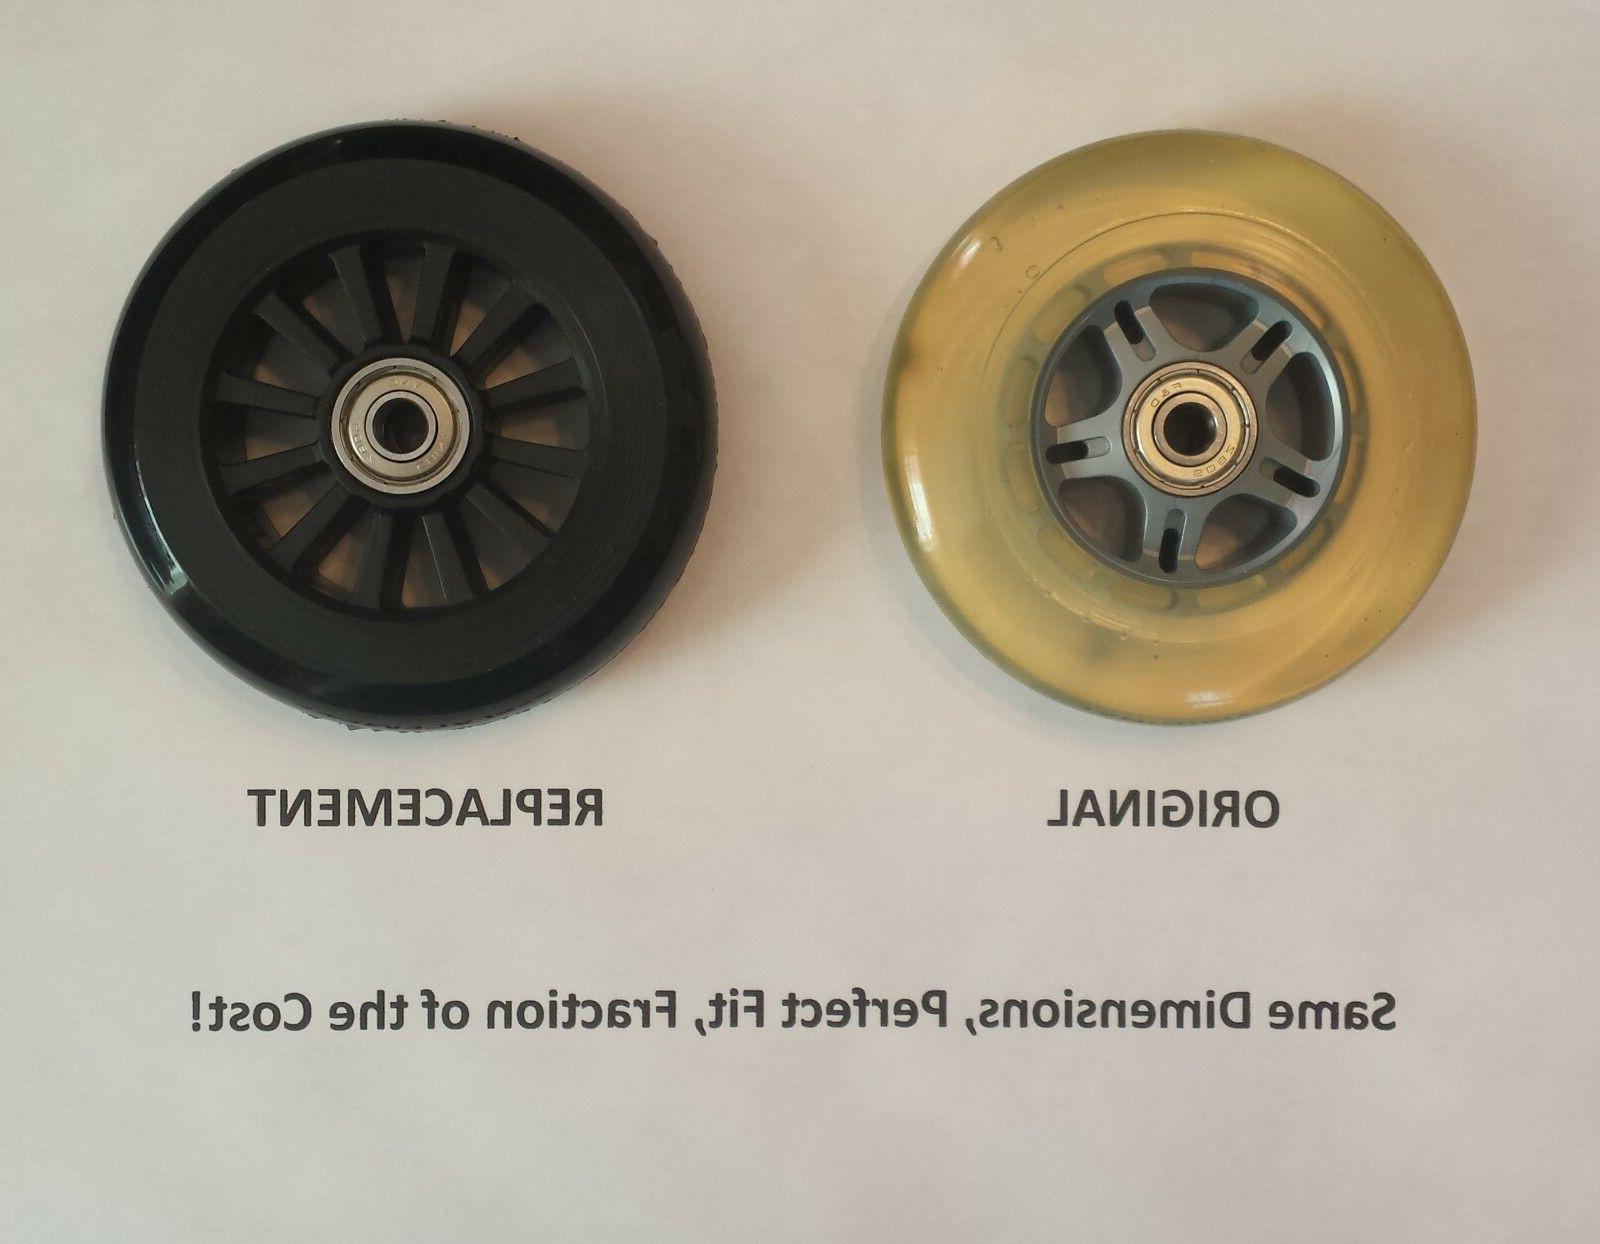 Elliptical Replacement Ramp Wheel Roller Healthrider NordicTrack Proform Reebok